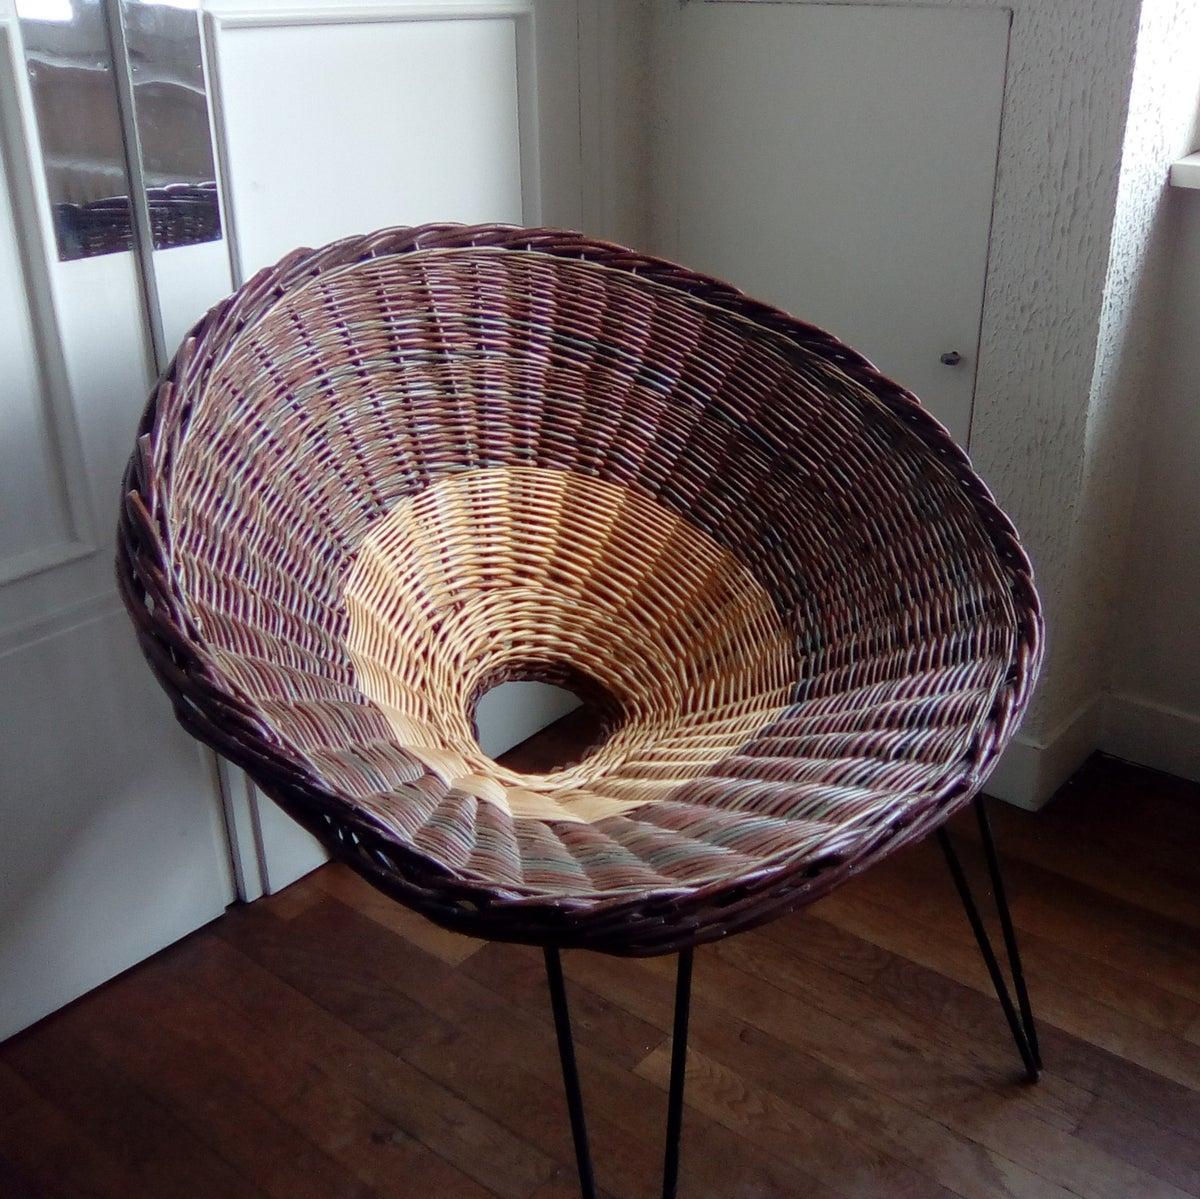 fauteuil osier cama eu design 50 fibresendeco vannerie artisanale mobilier vintage. Black Bedroom Furniture Sets. Home Design Ideas